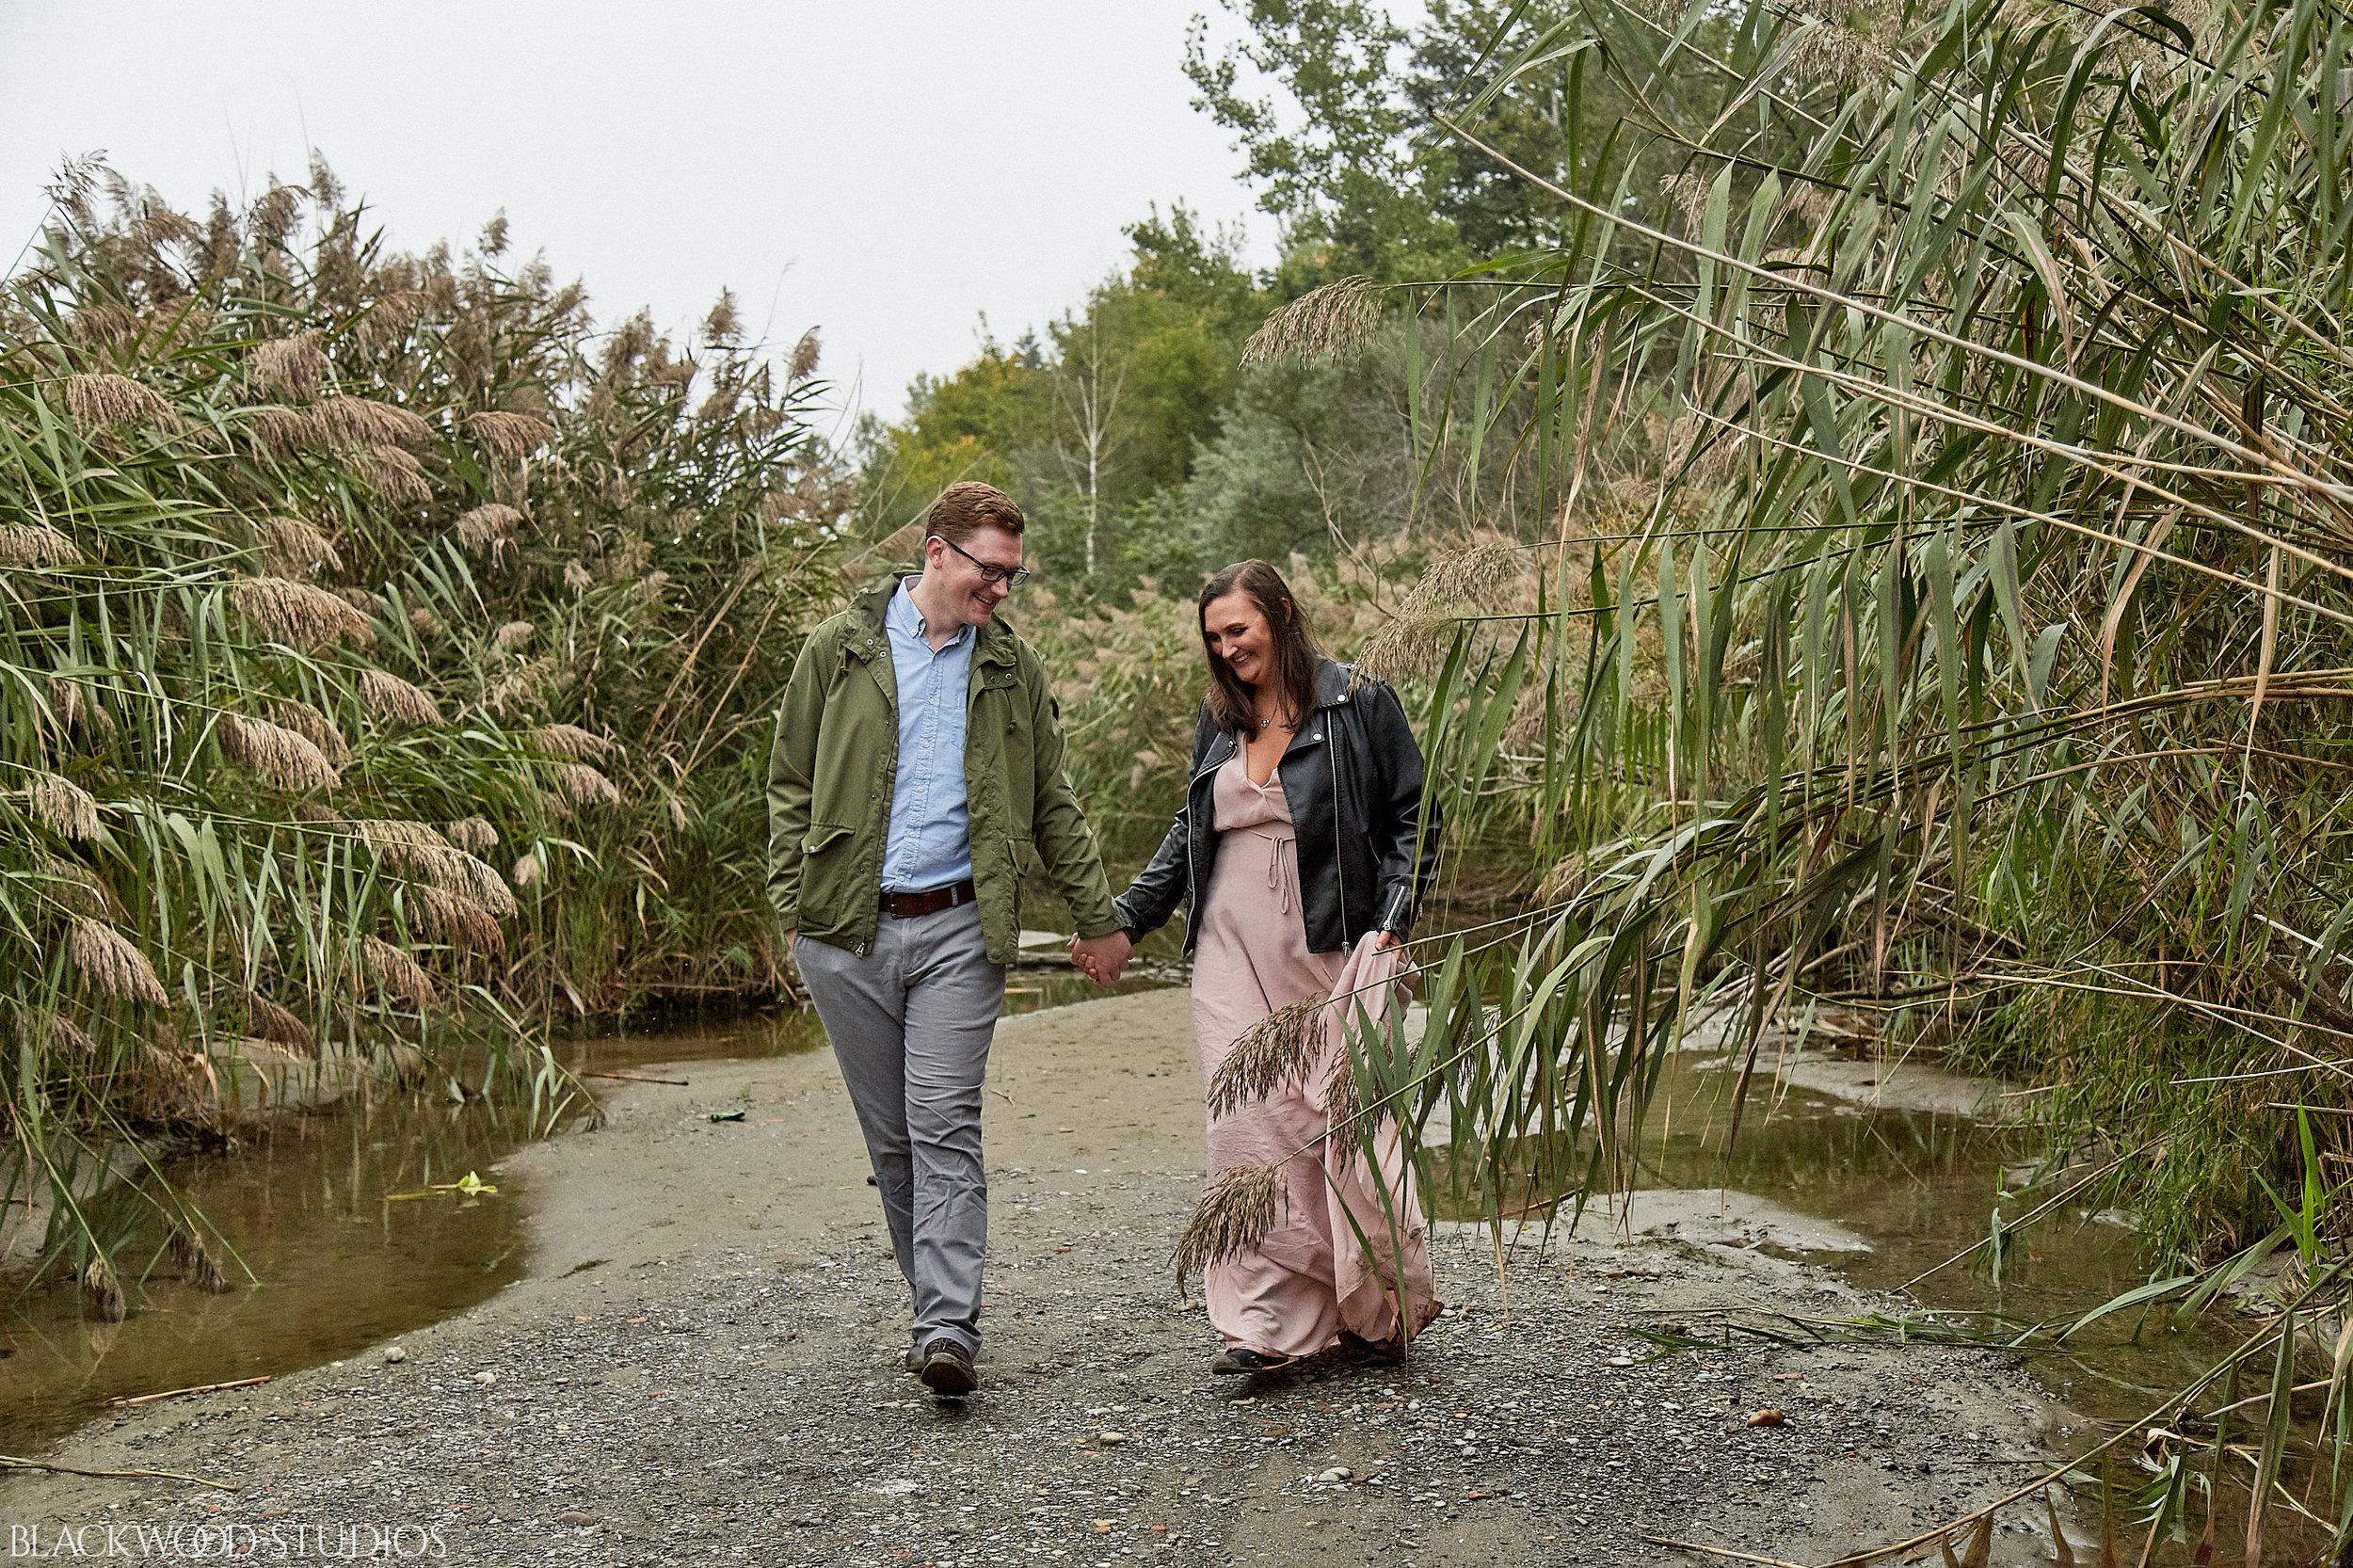 Blackwood-Studios-20181008-17-48-00-Justin-and-Samantha-Engagement-Photography-foggy-Scaraborough-Bluffs-Park-Ontario.jpg